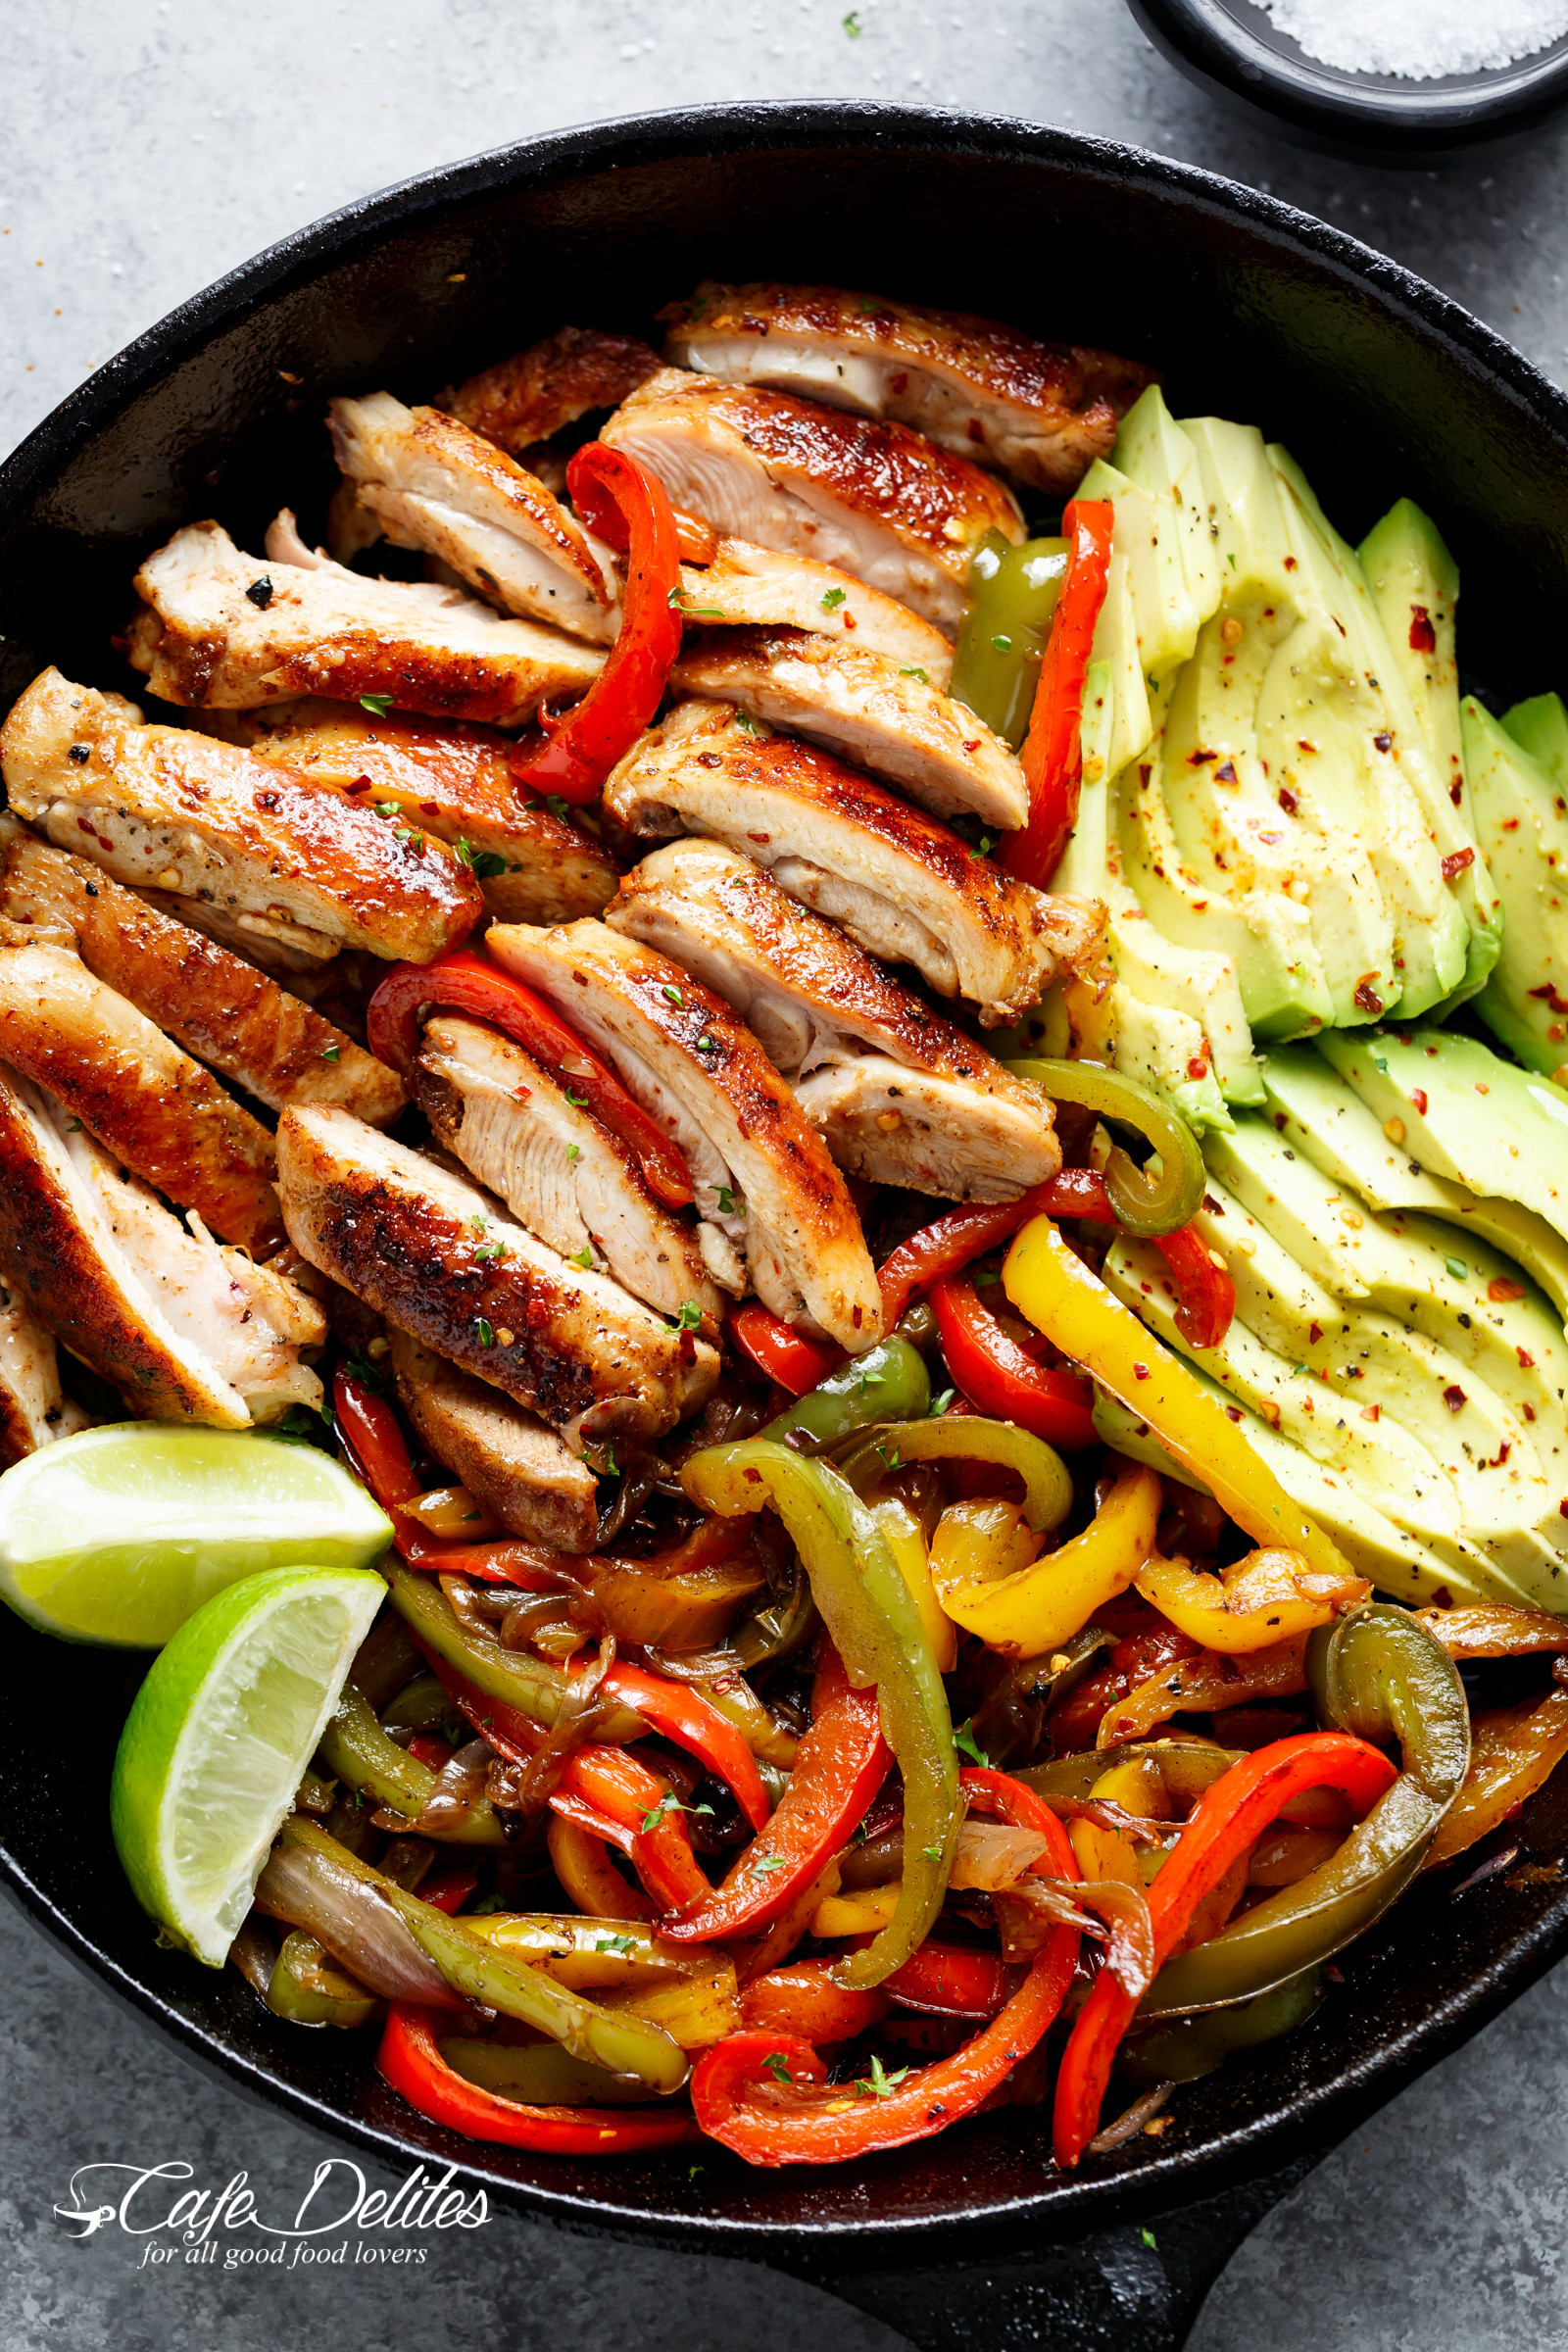 Mexican Chicken Fajita Recipes  Best Chicken Fajitas Cafe Delites TheDirtyGyro